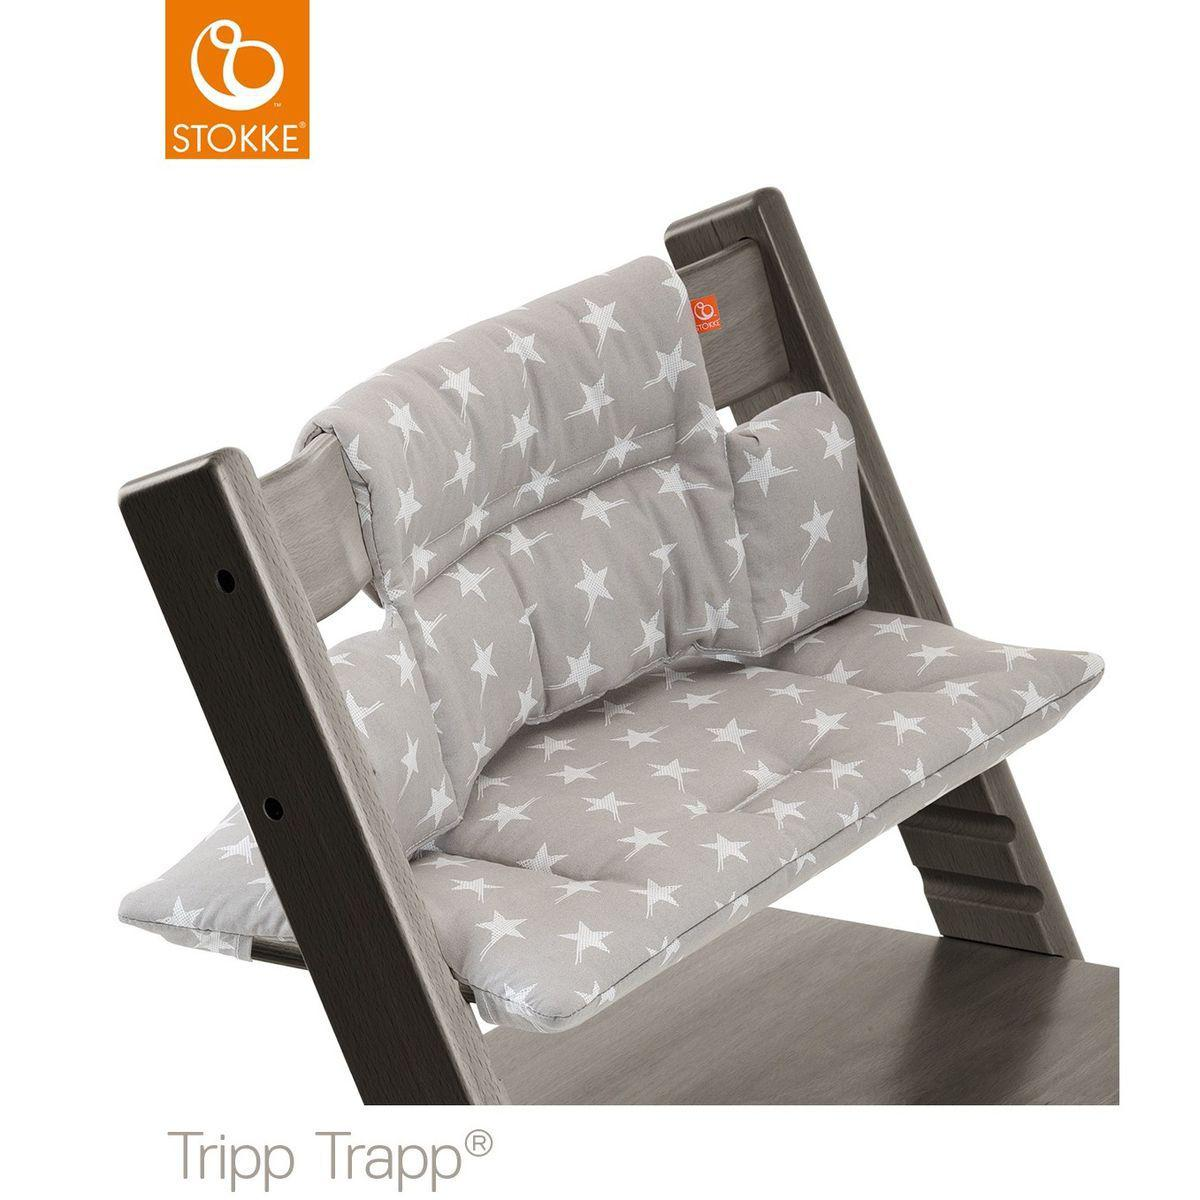 Cojín trona bebé TRIPP TRAPP Stokke estrellas gris